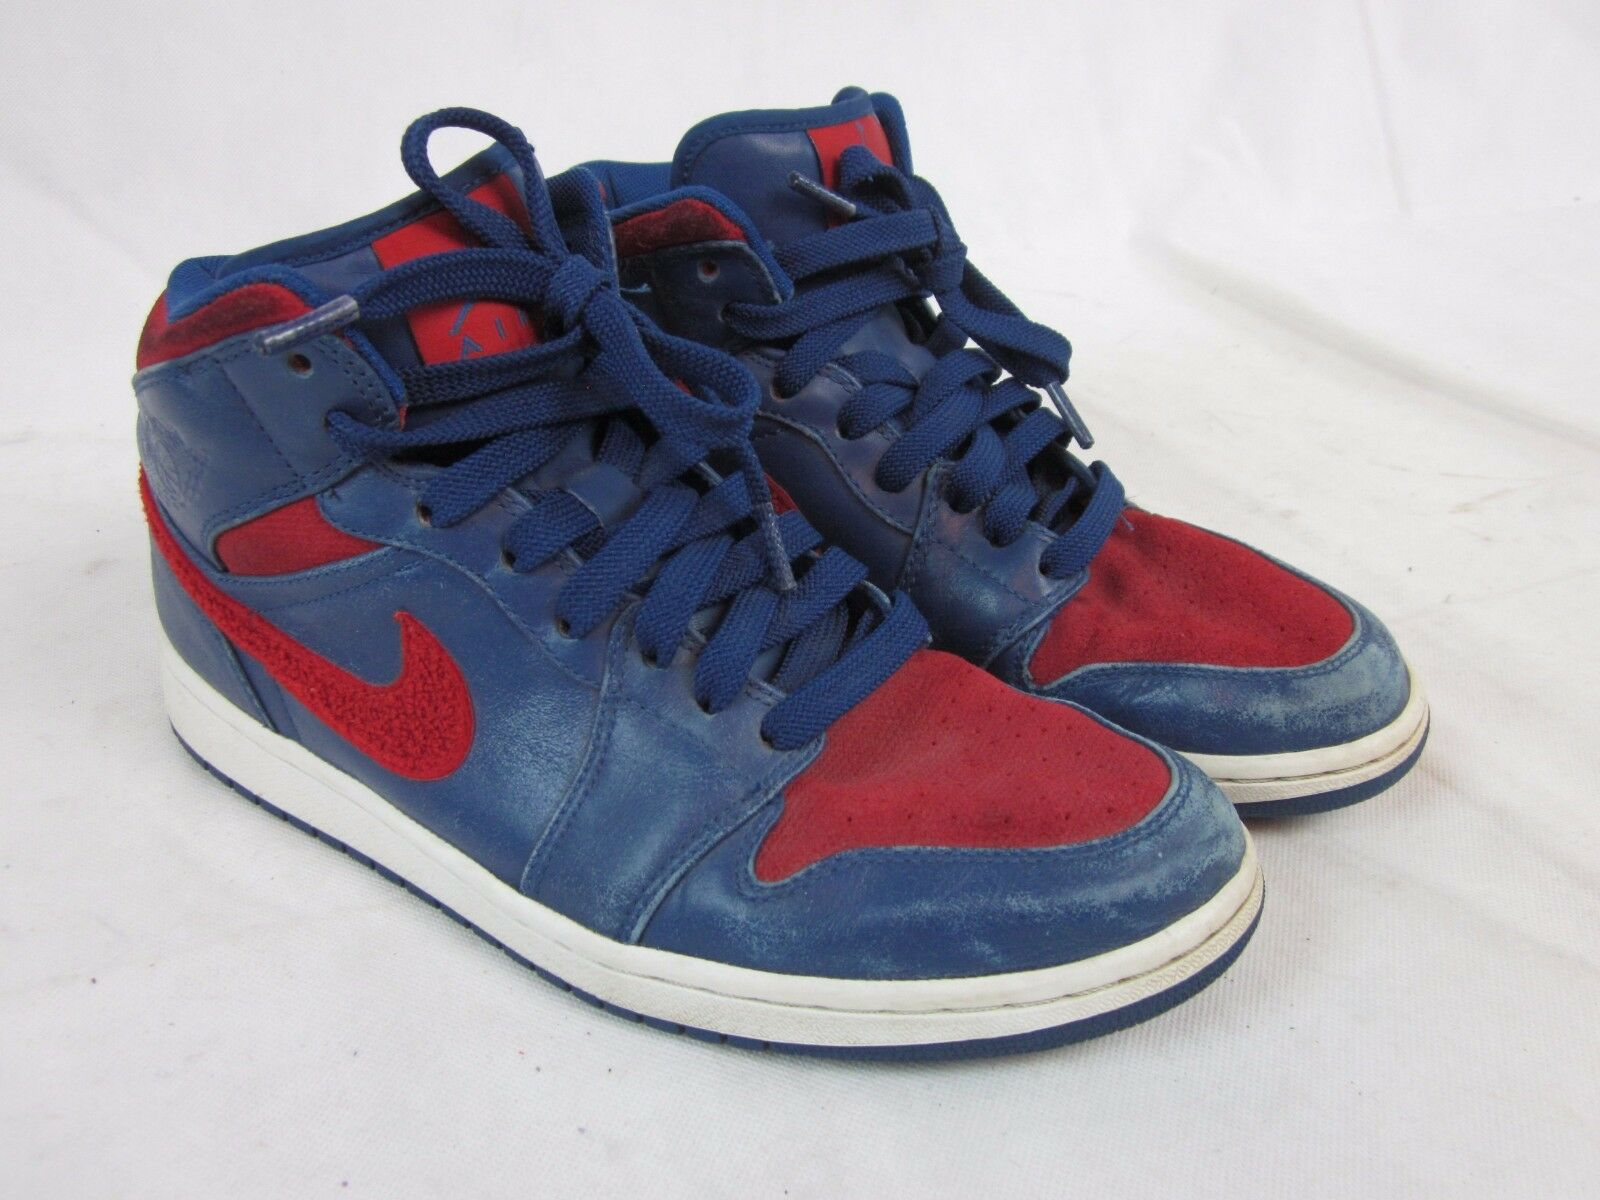 Nike Air Jordan I 1 Retro Phat Premier bluee Red Detroit Pistons 375173-461 SZ 10